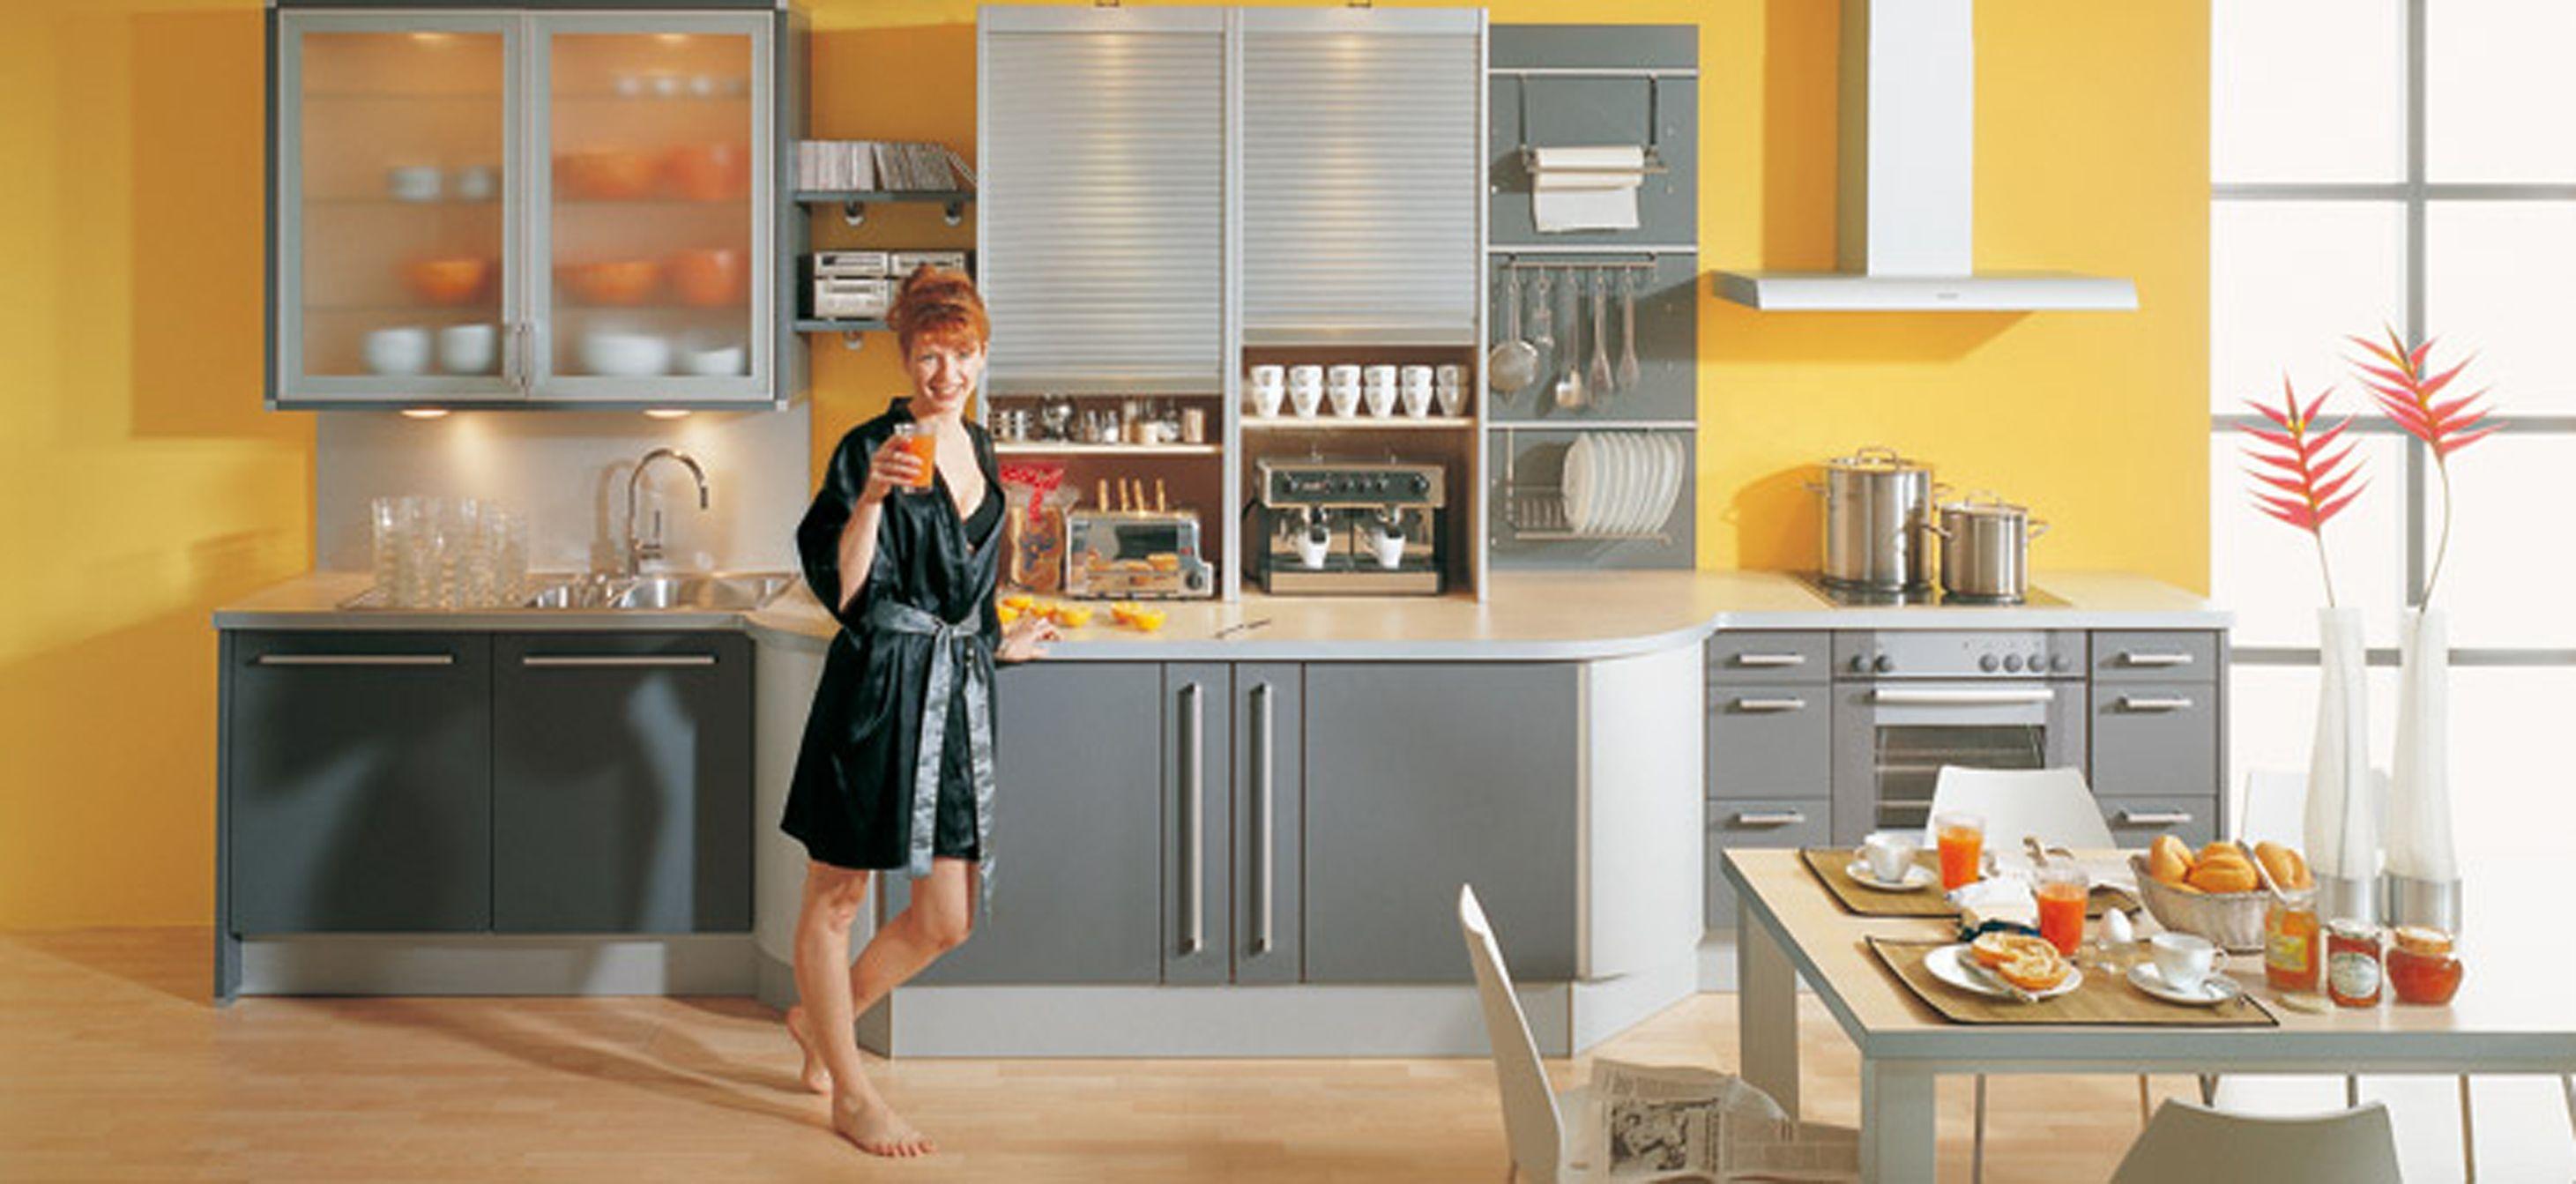 Medium Of Unusual Kitchen Designs